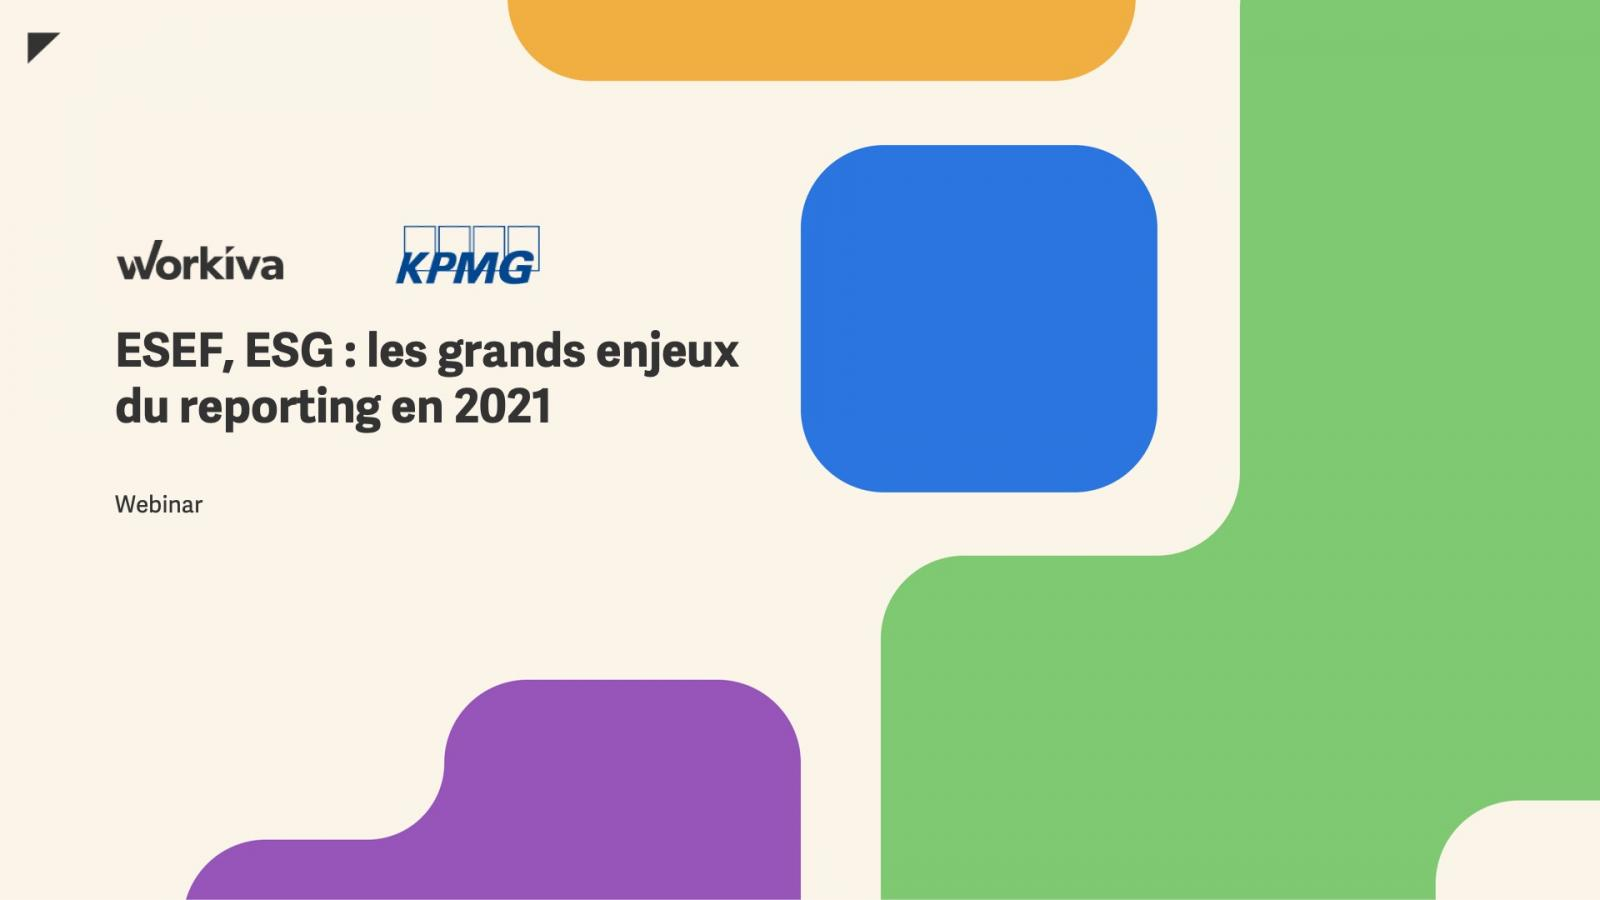 ESEF, ESG : les grands enjeux du reporting en 2021